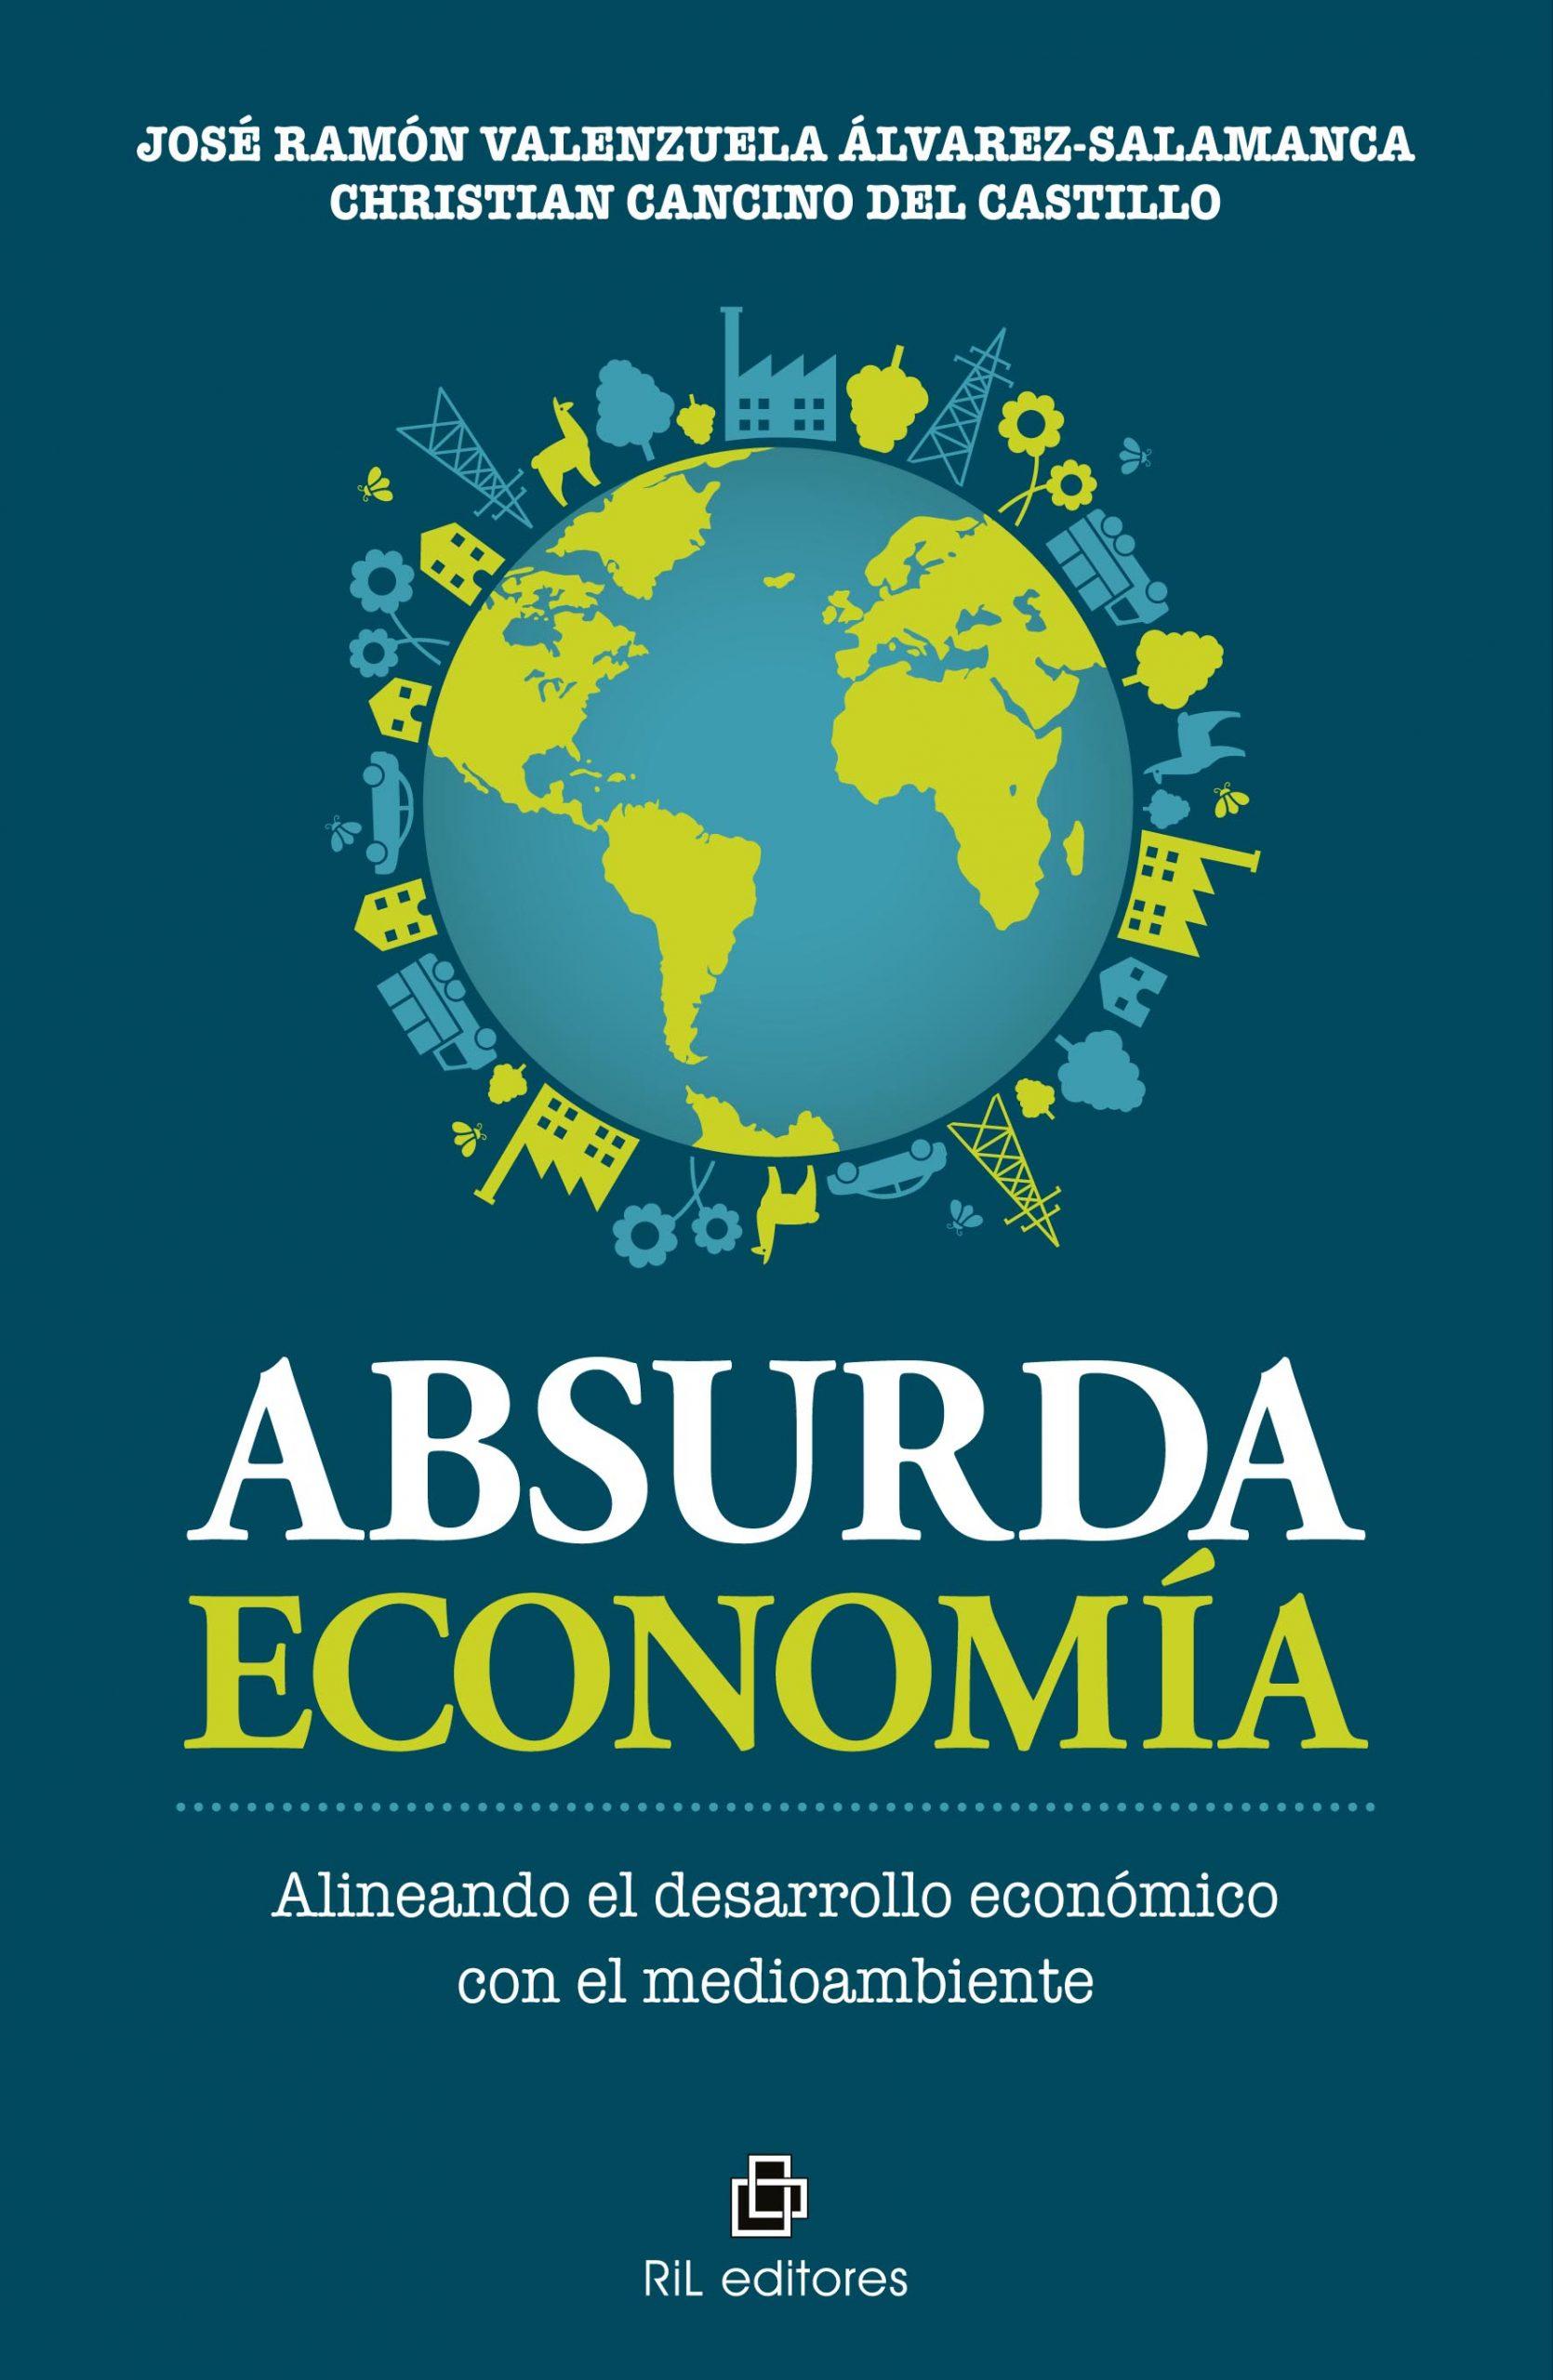 Absurda economía 1